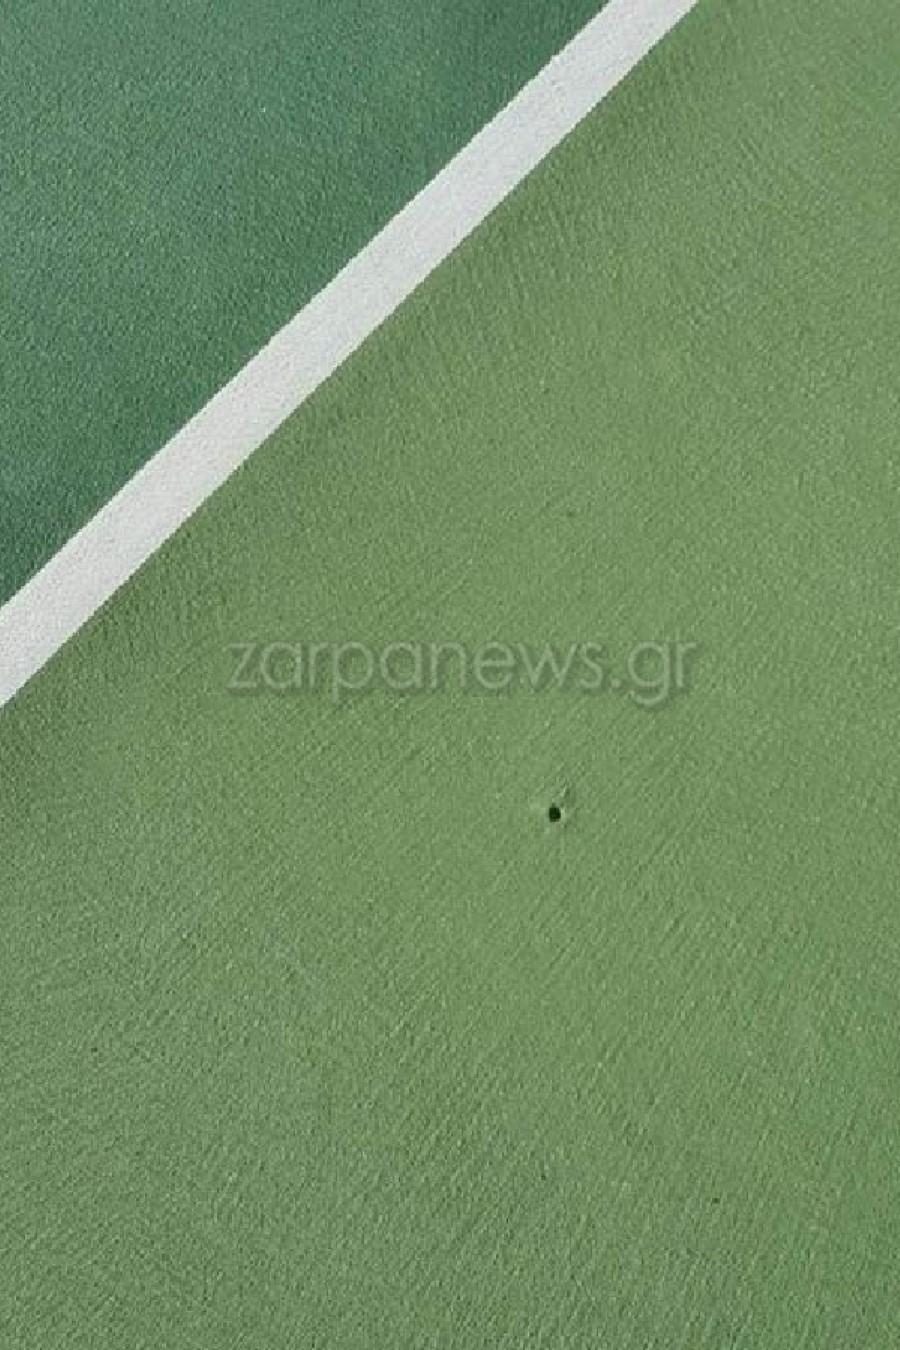 sfaira_tennis1